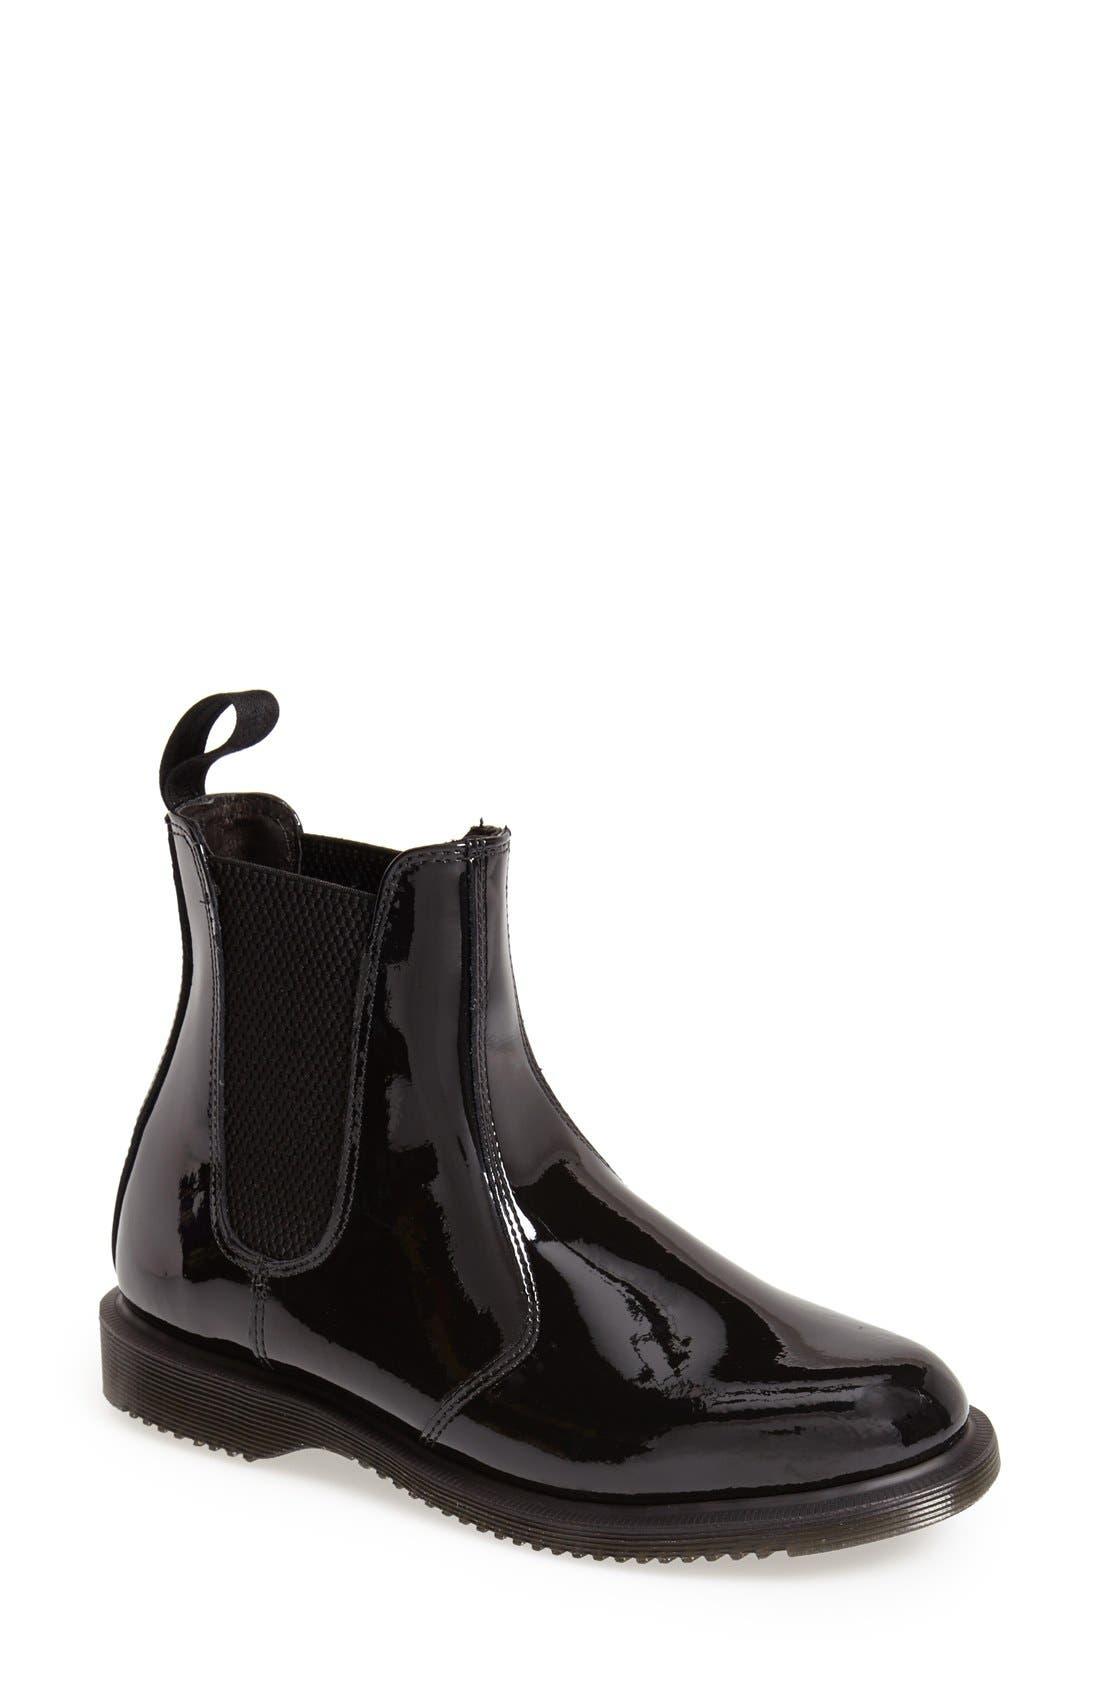 Main Image - Dr. Martens 'Faun' Patent Chelsea Boot (Women)